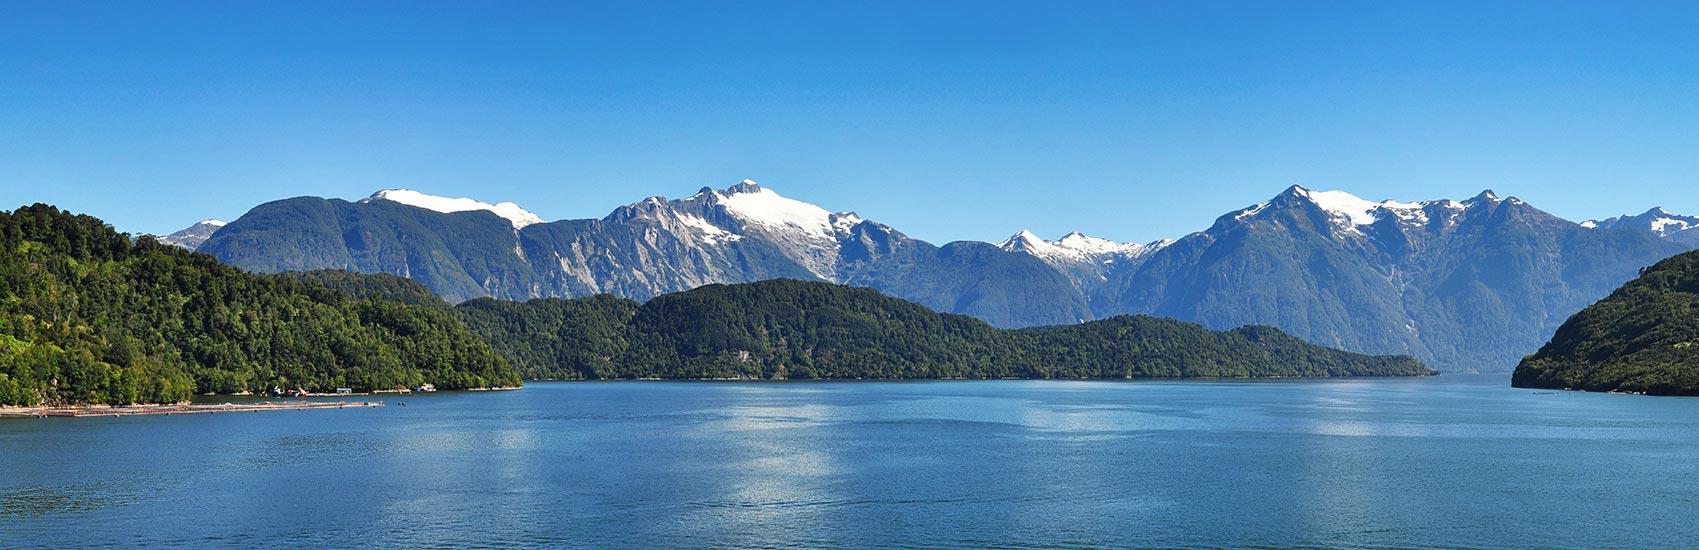 Sensational South America with Oceania Cruises 2